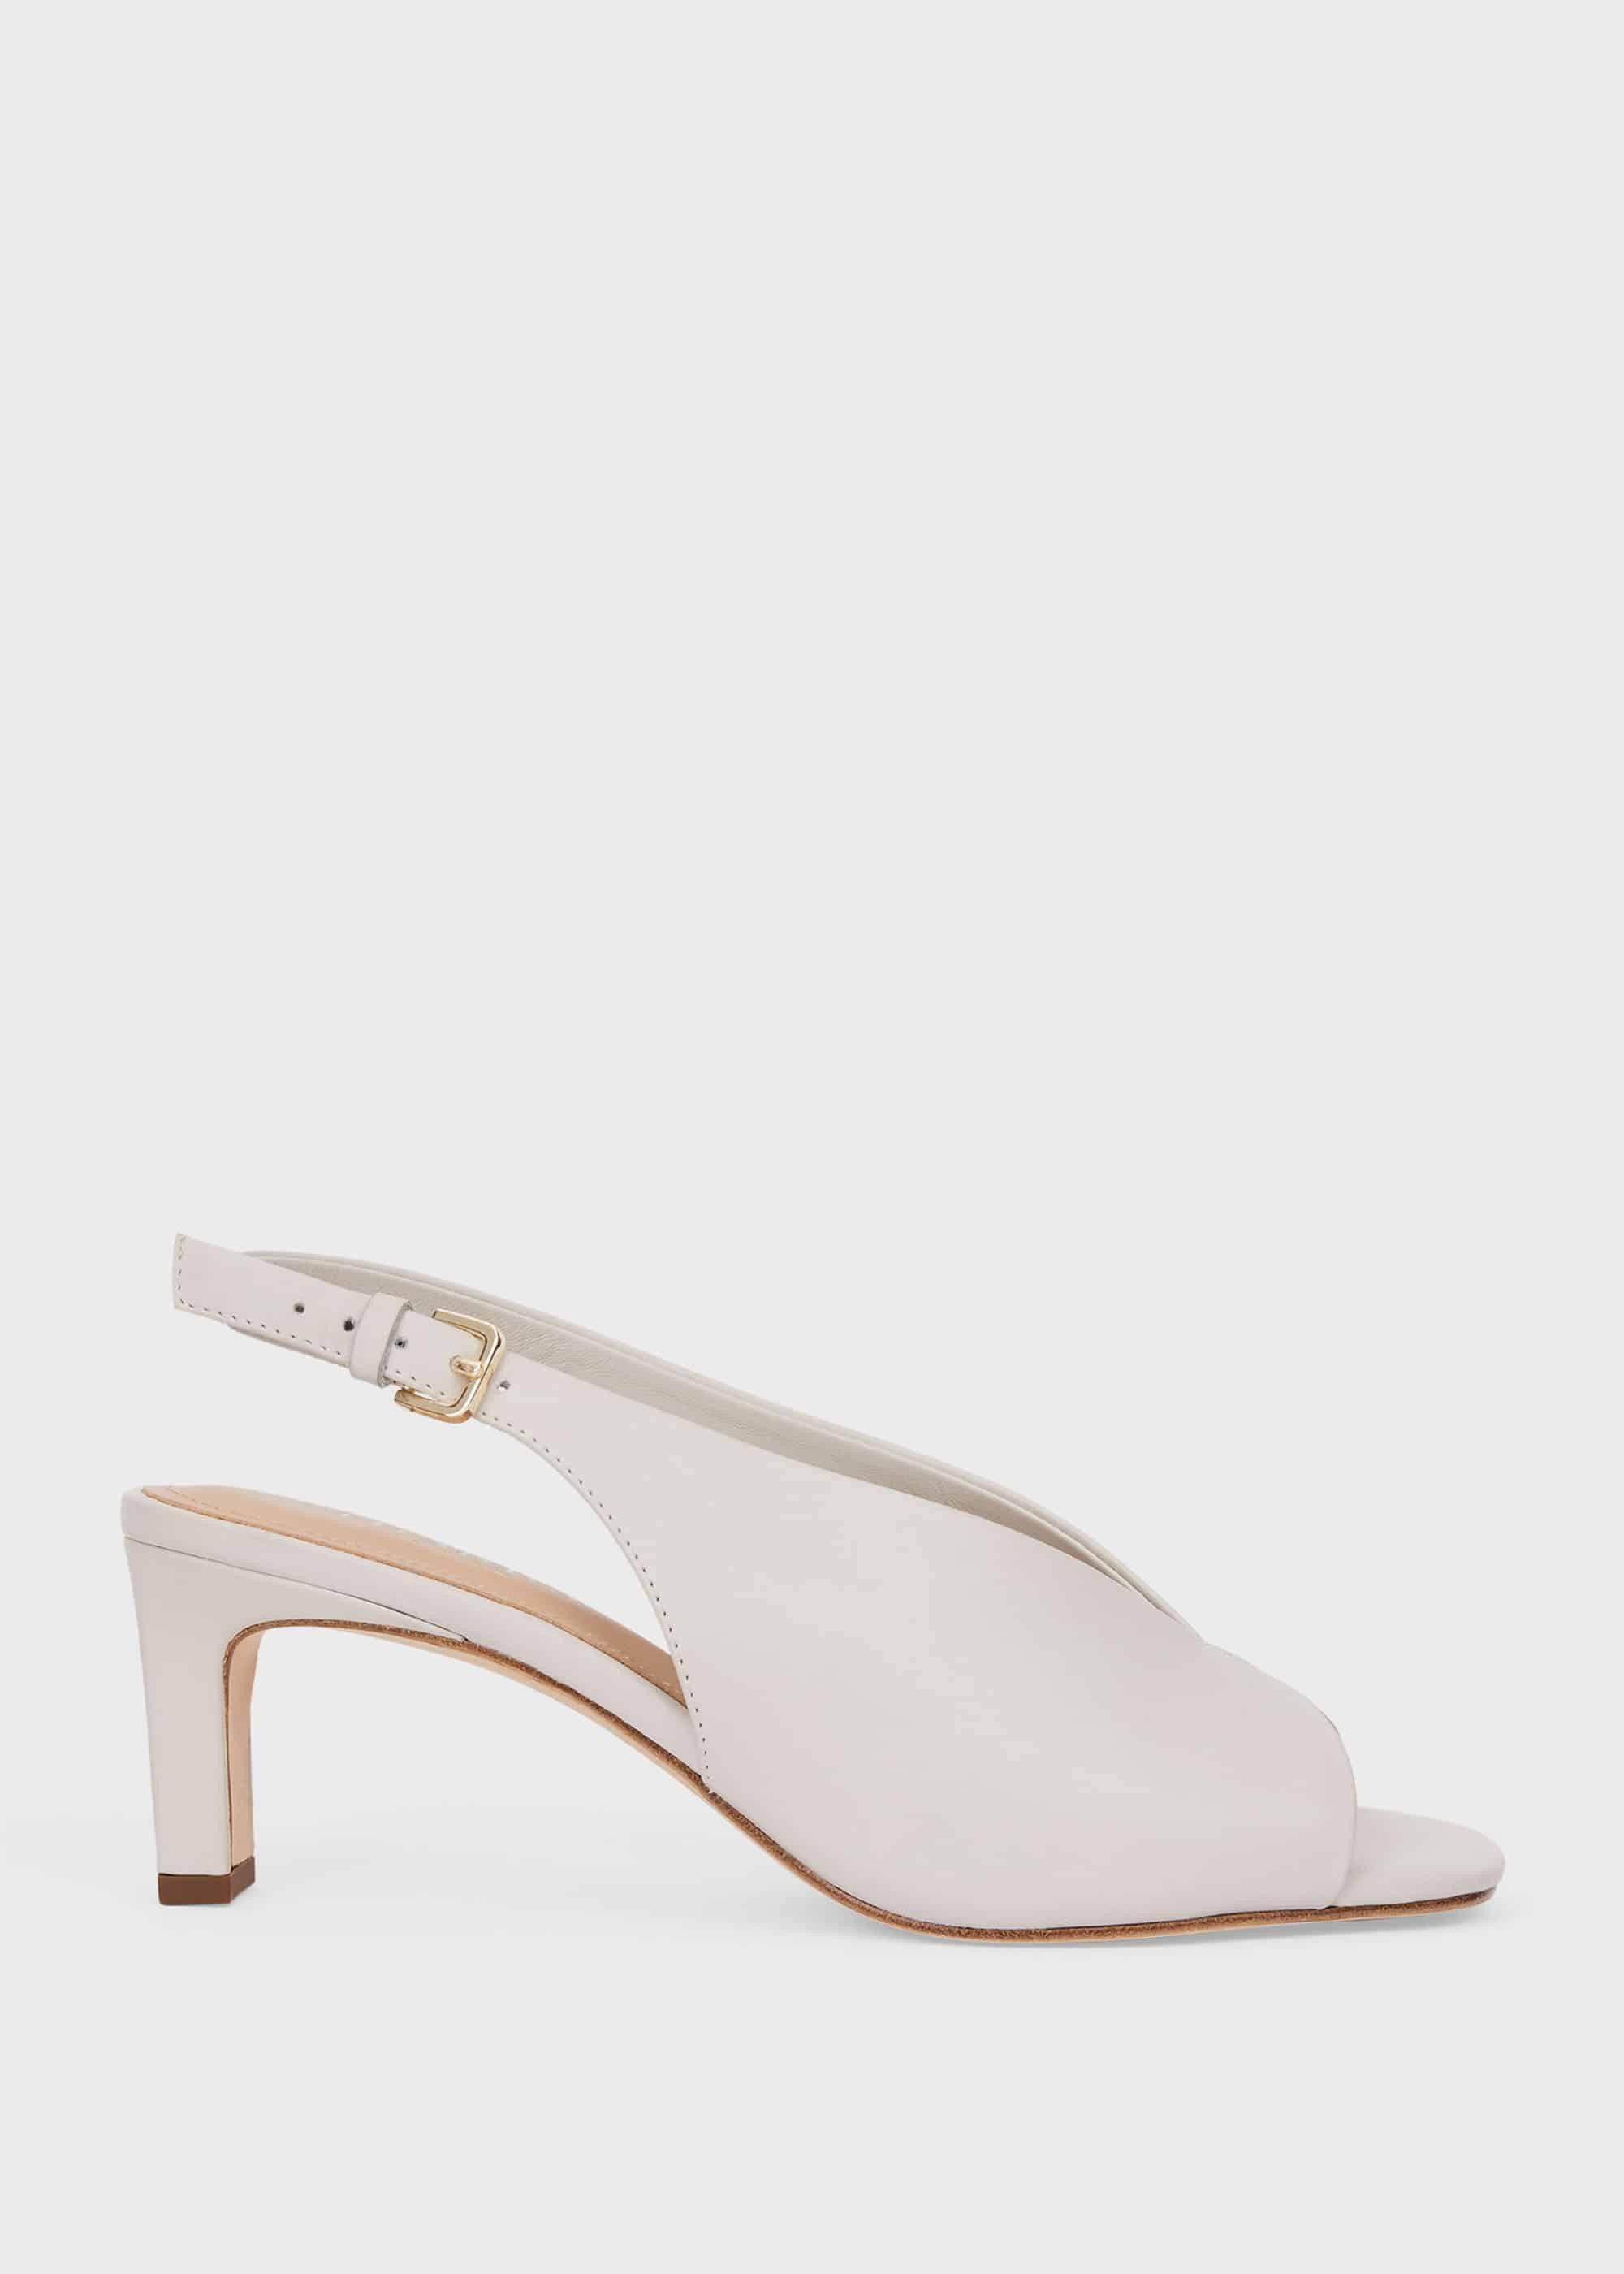 Hobbs Women Sarah Leather Sandals